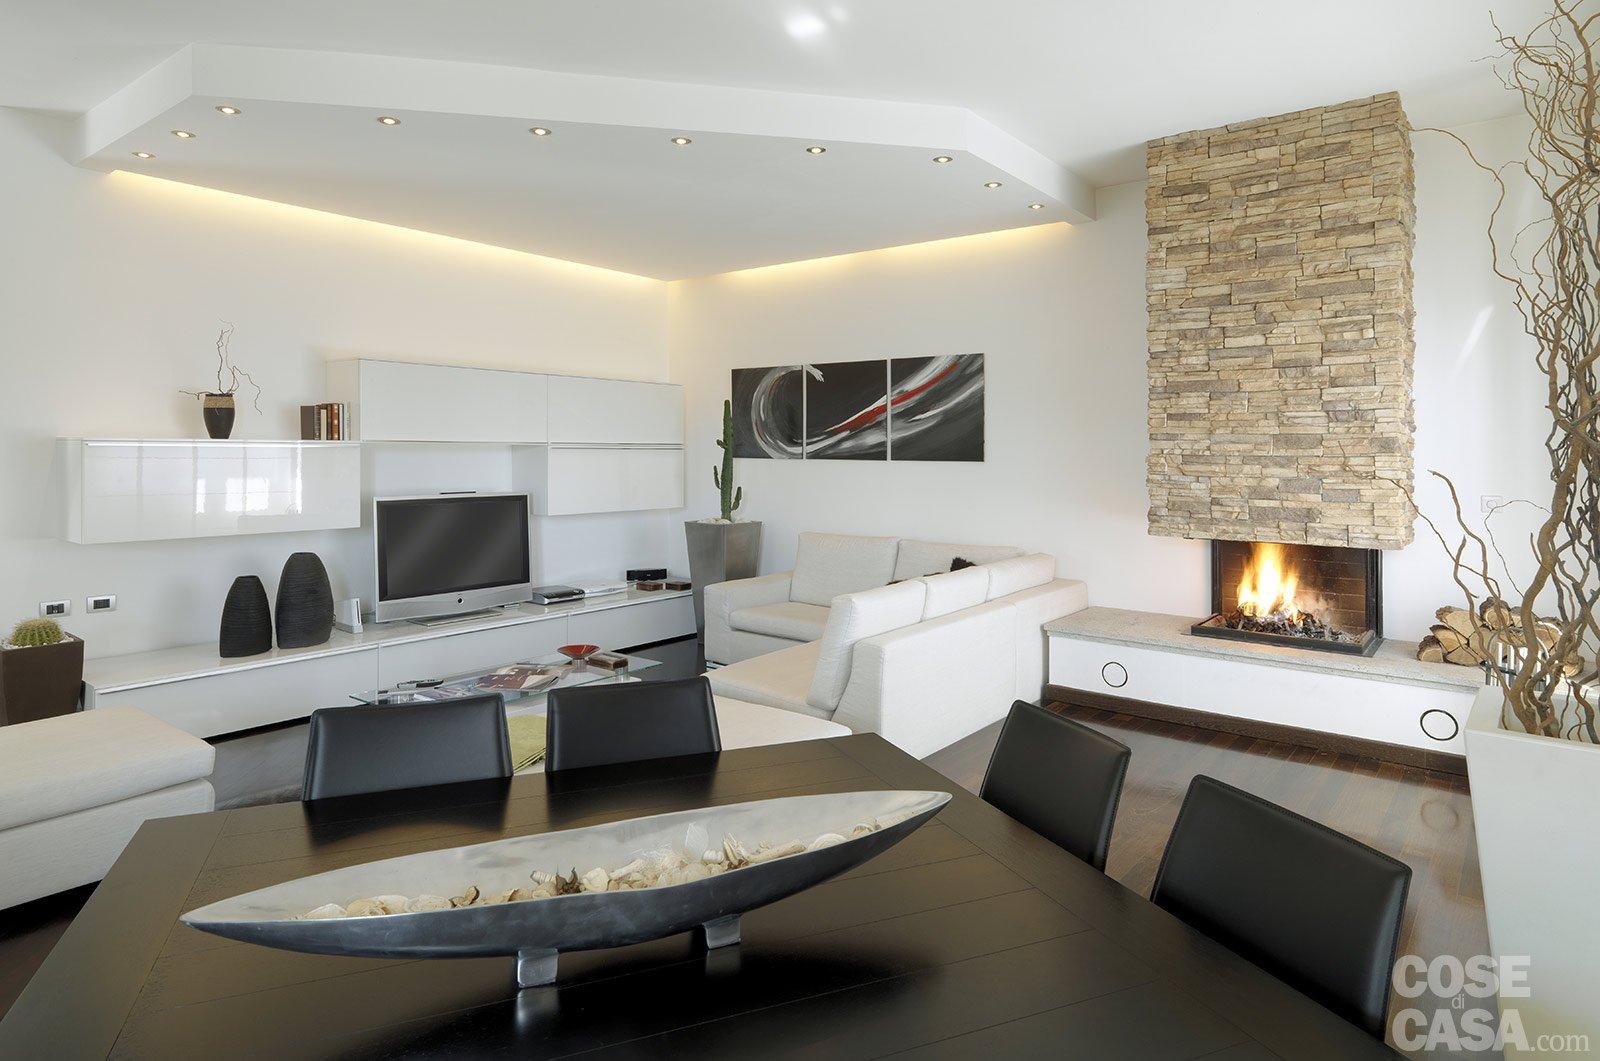 Una casa moderna su livelli sfalsati cose di casa for Soluzioni per salotti